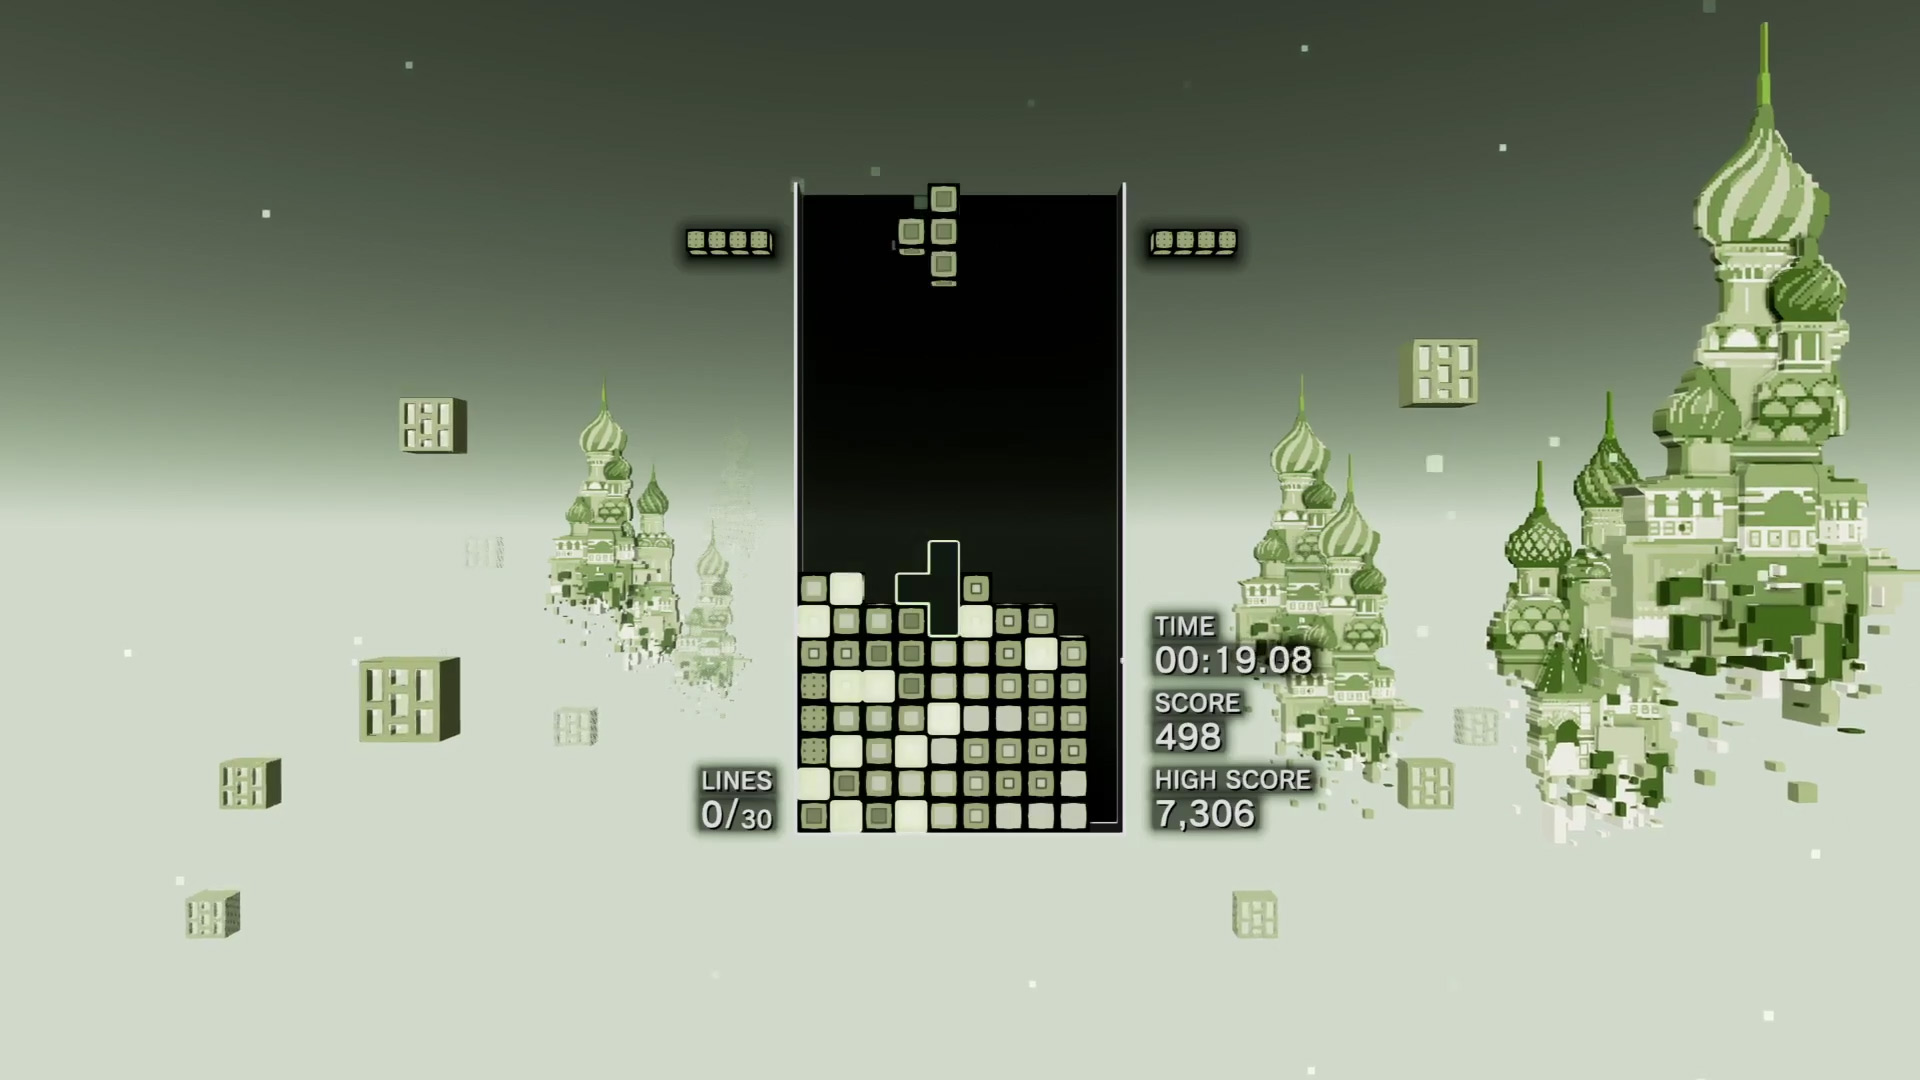 Tetris Effect has a cool unlockable 1989 stage screenshot